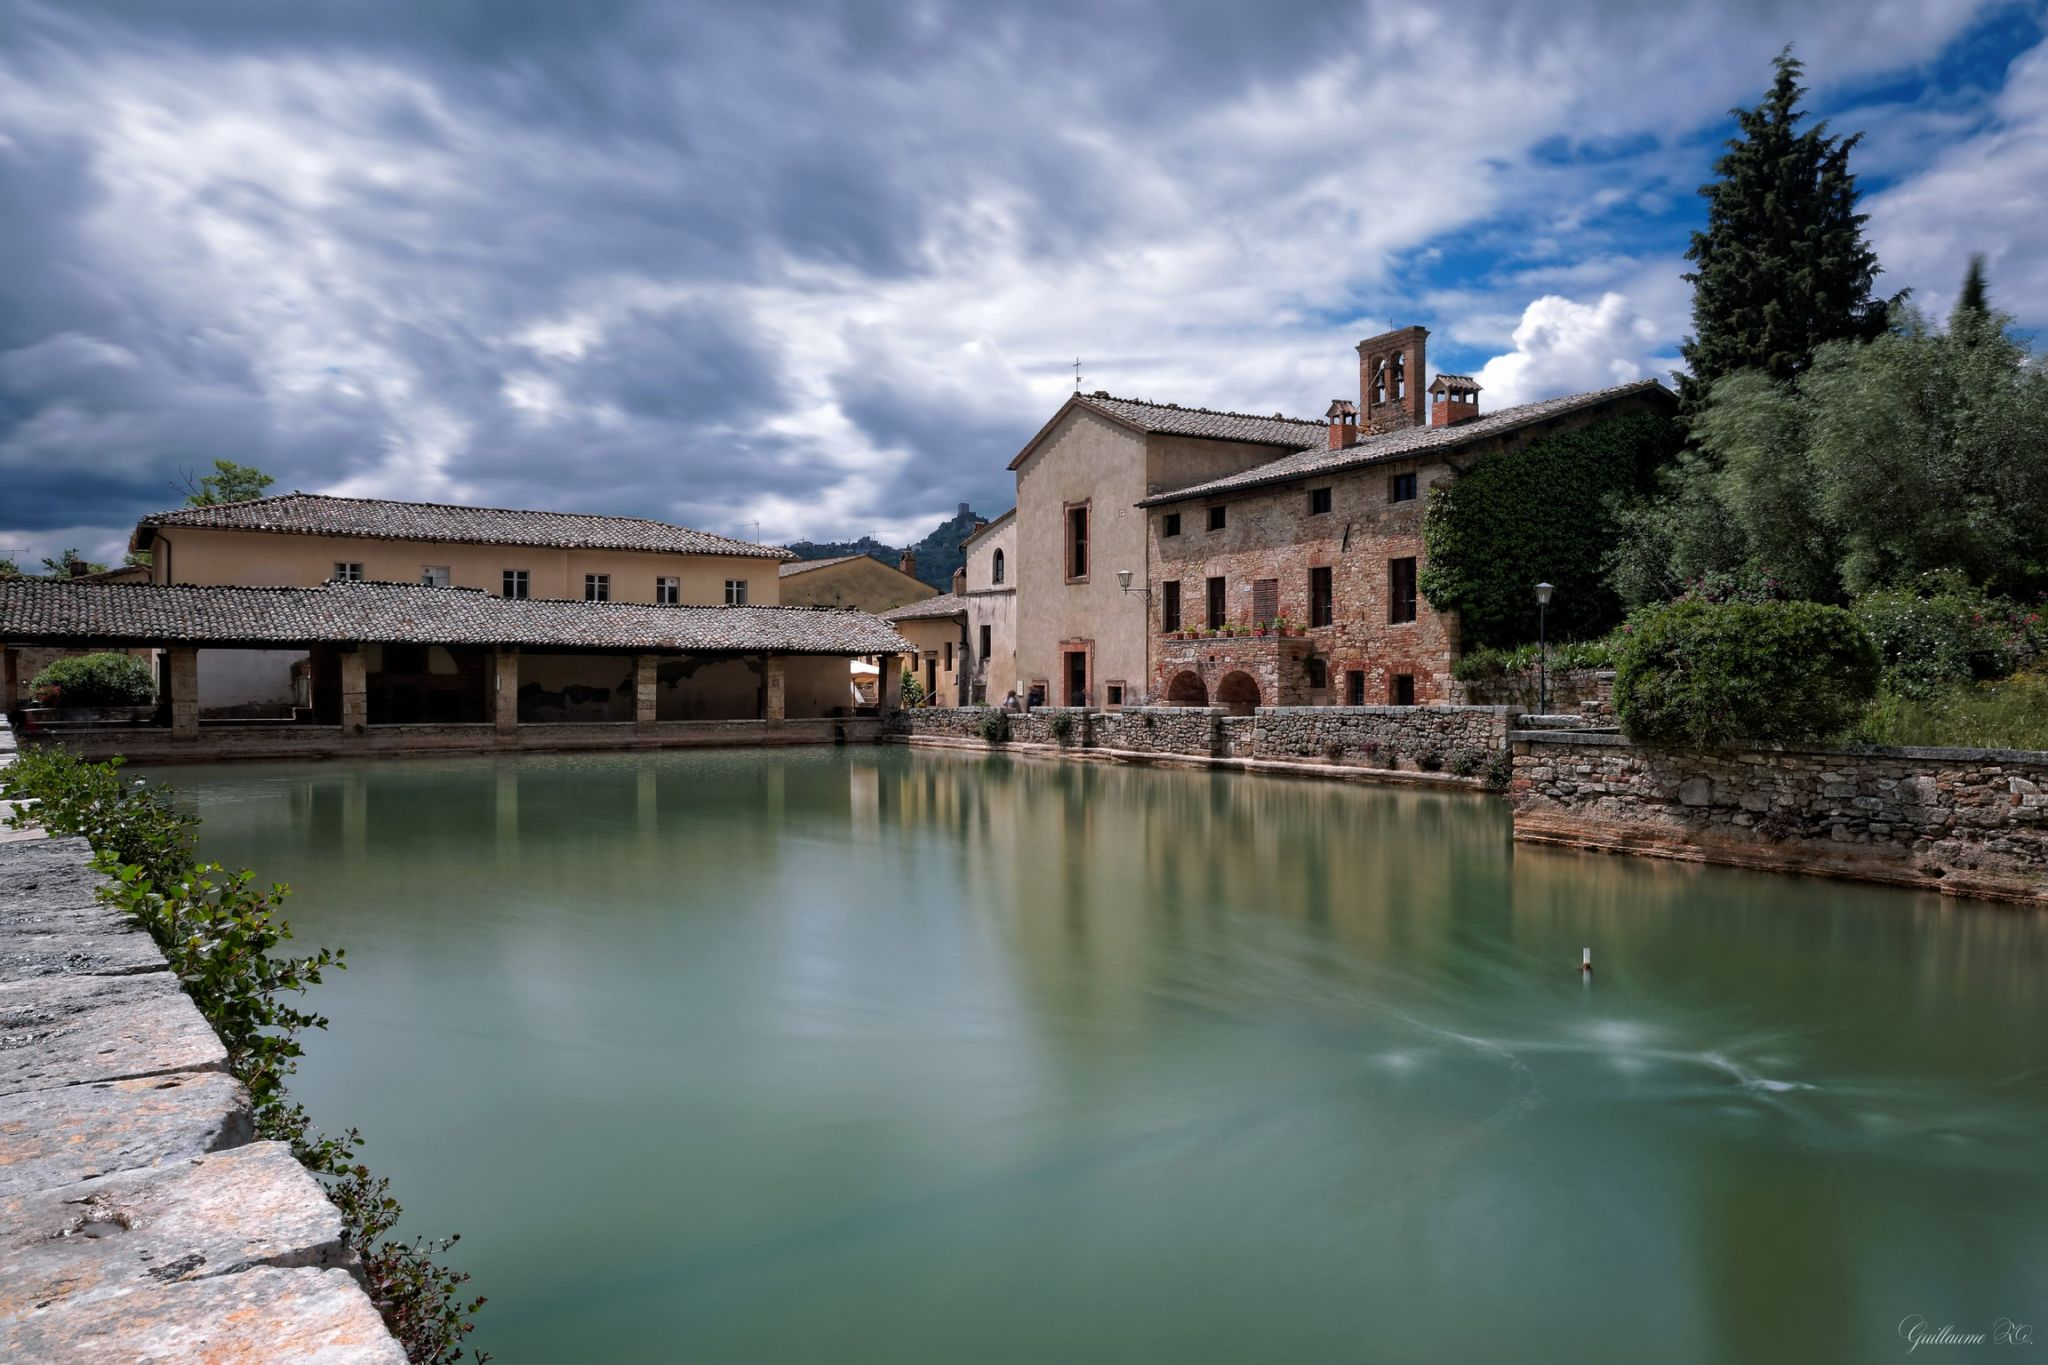 Bagno Vignoni (Toscana), Italy